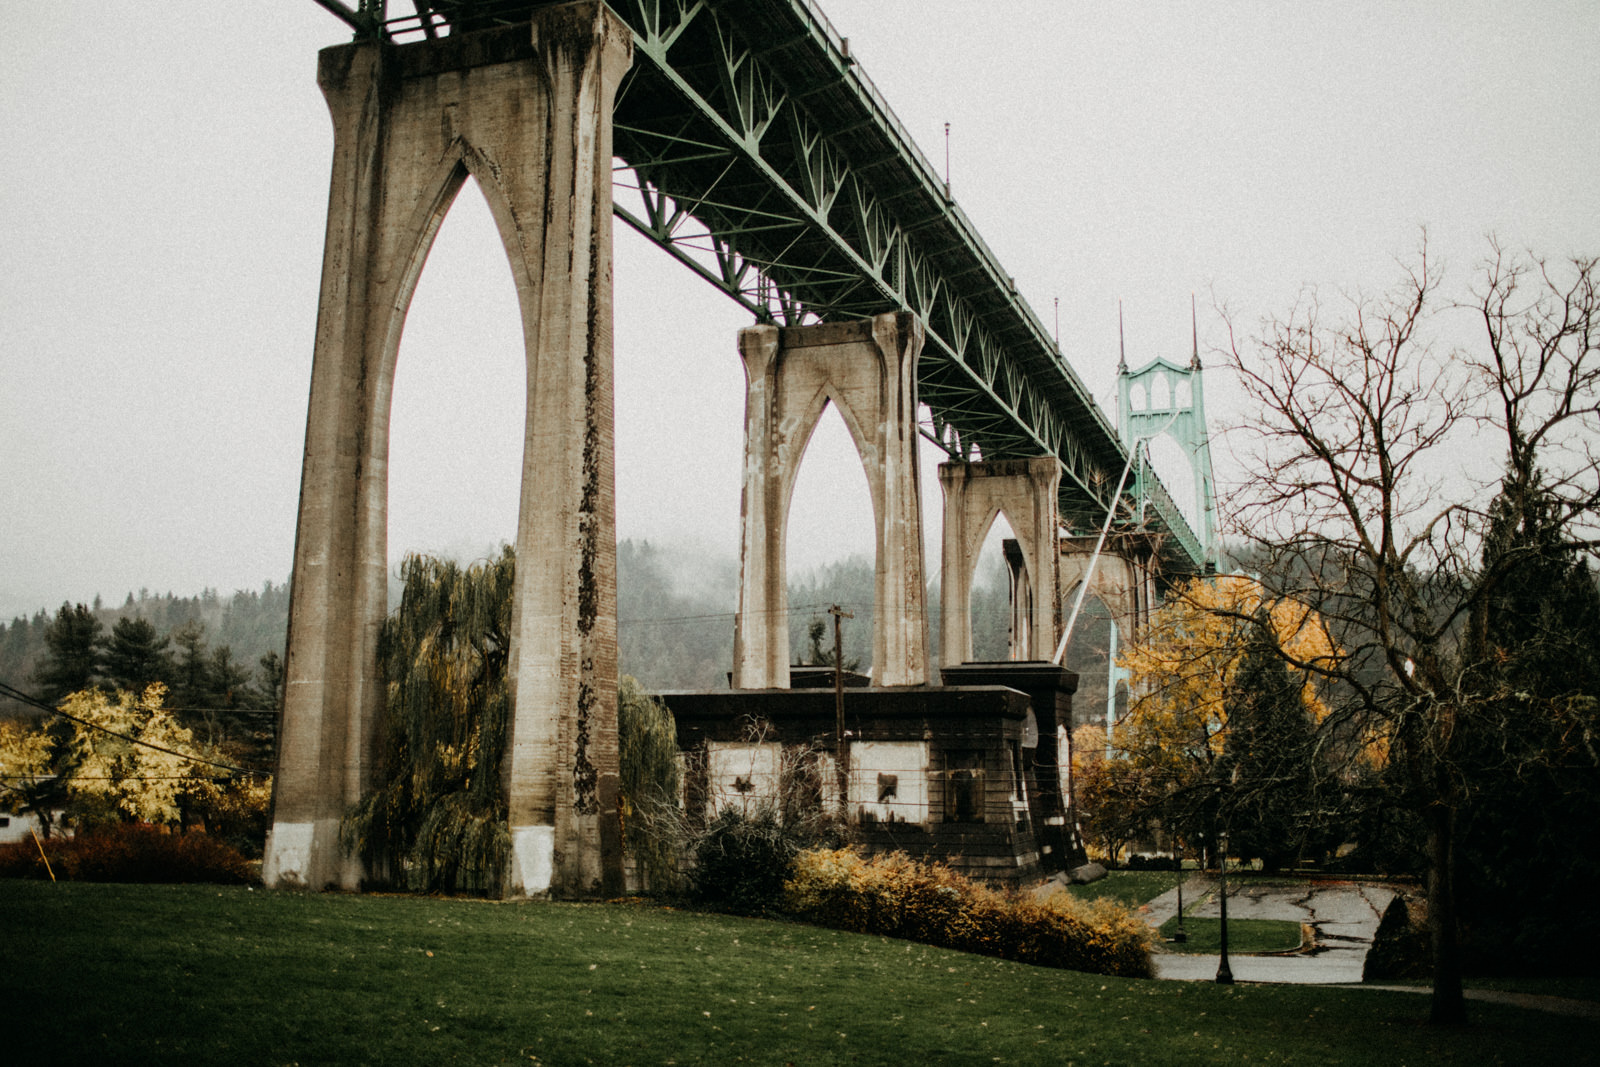 st johns bridge in portland, oregon